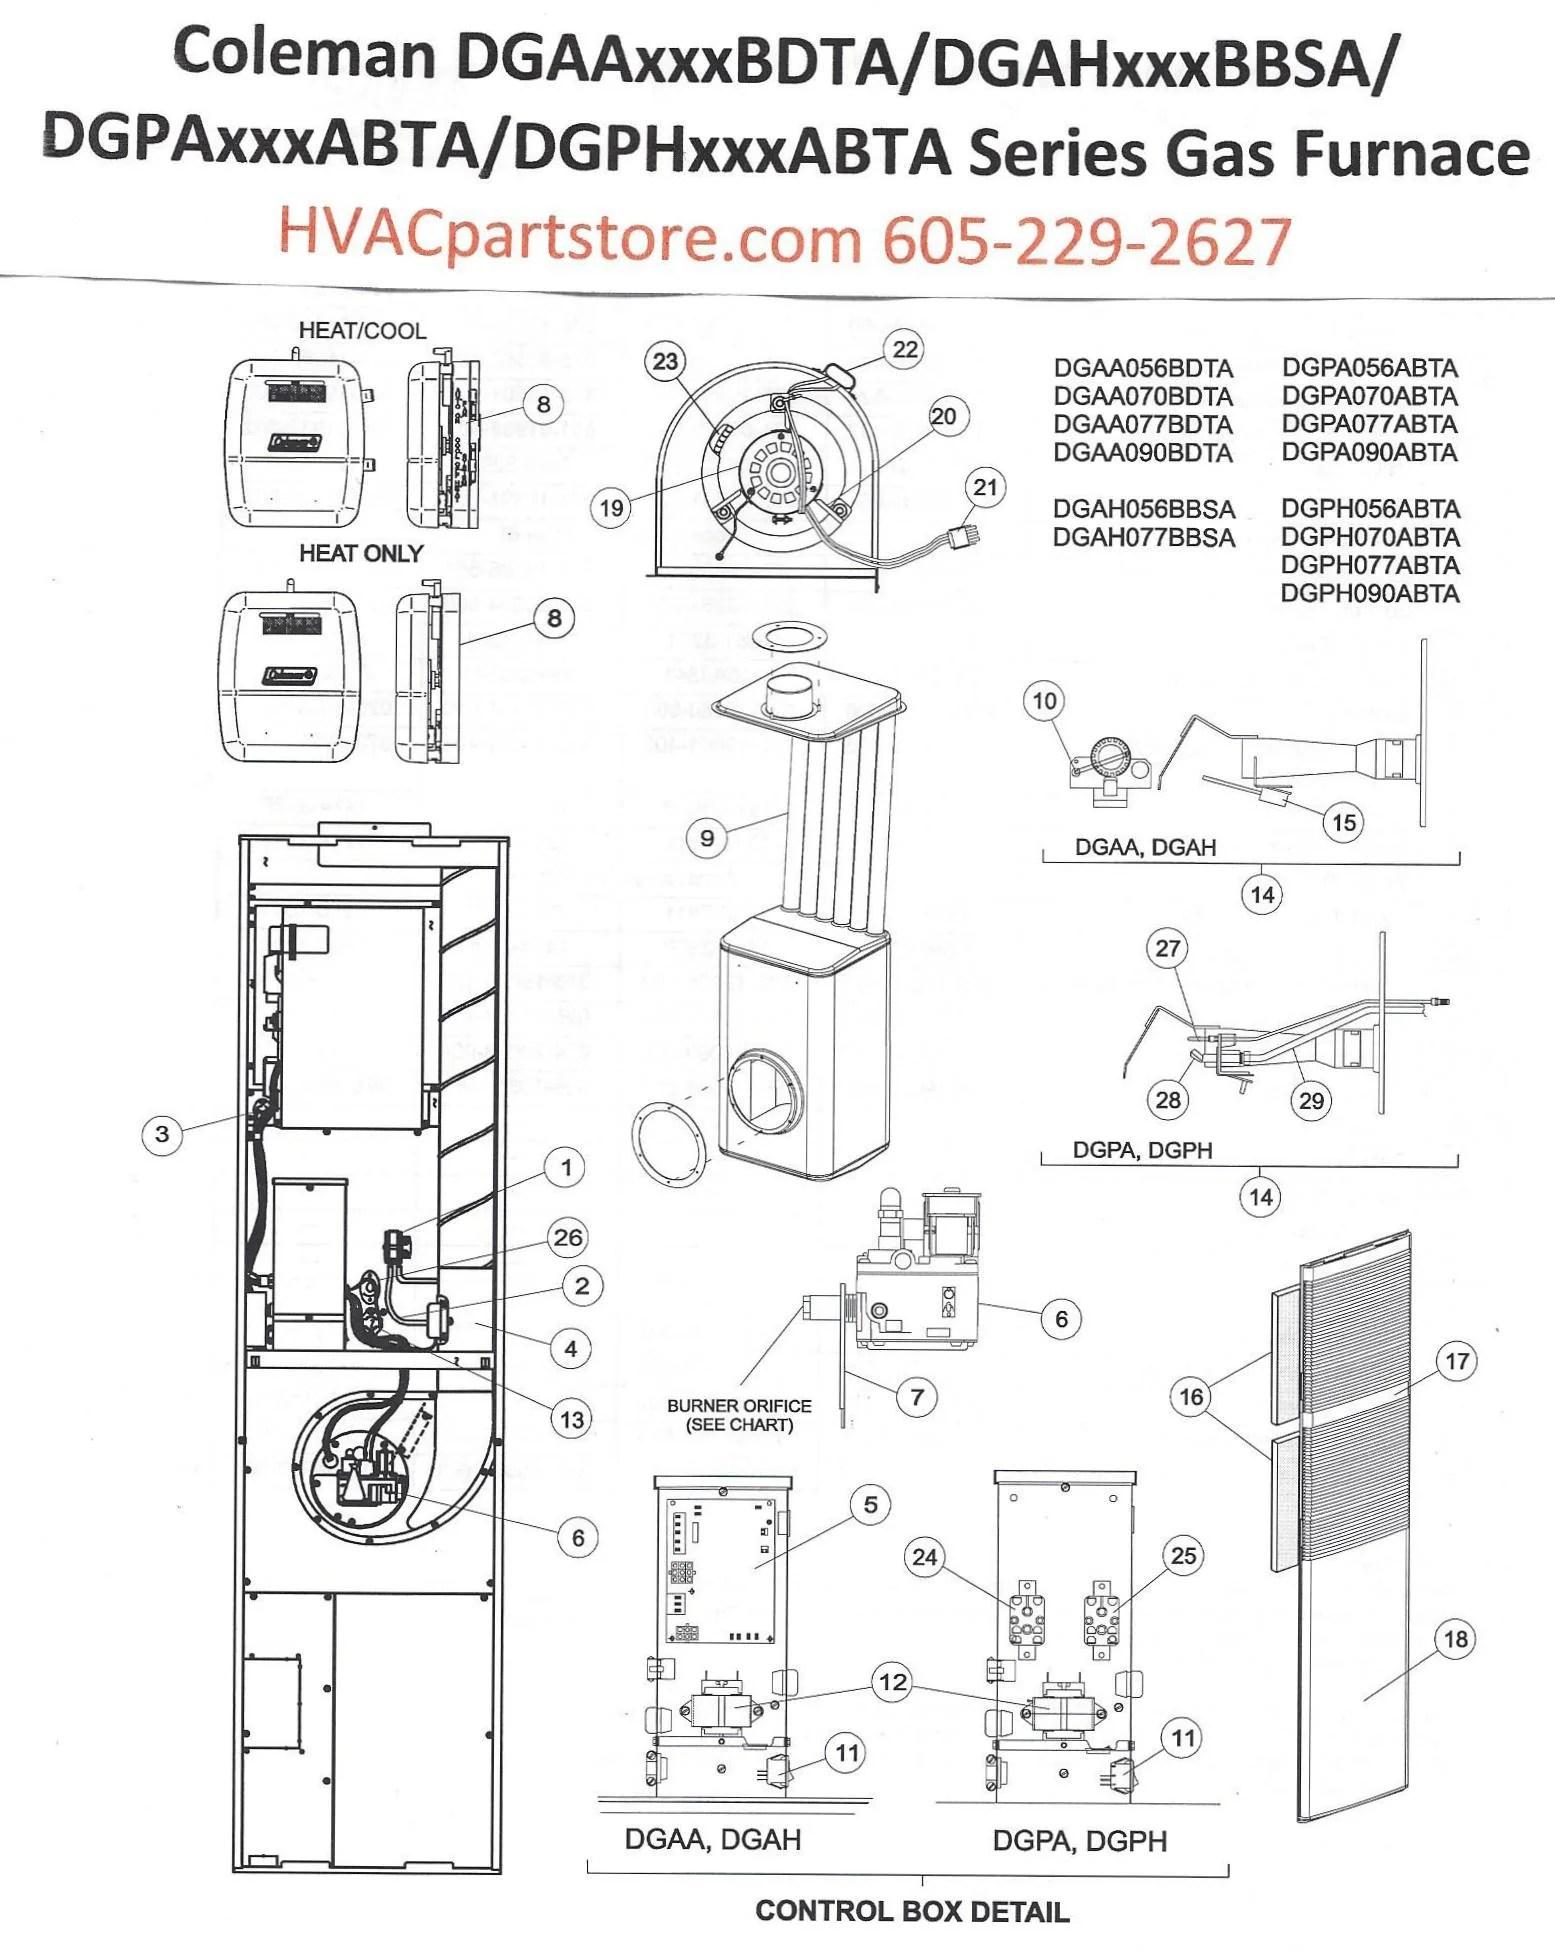 dgaa090bdta coleman gas furnace parts [ 1555 x 1955 Pixel ]